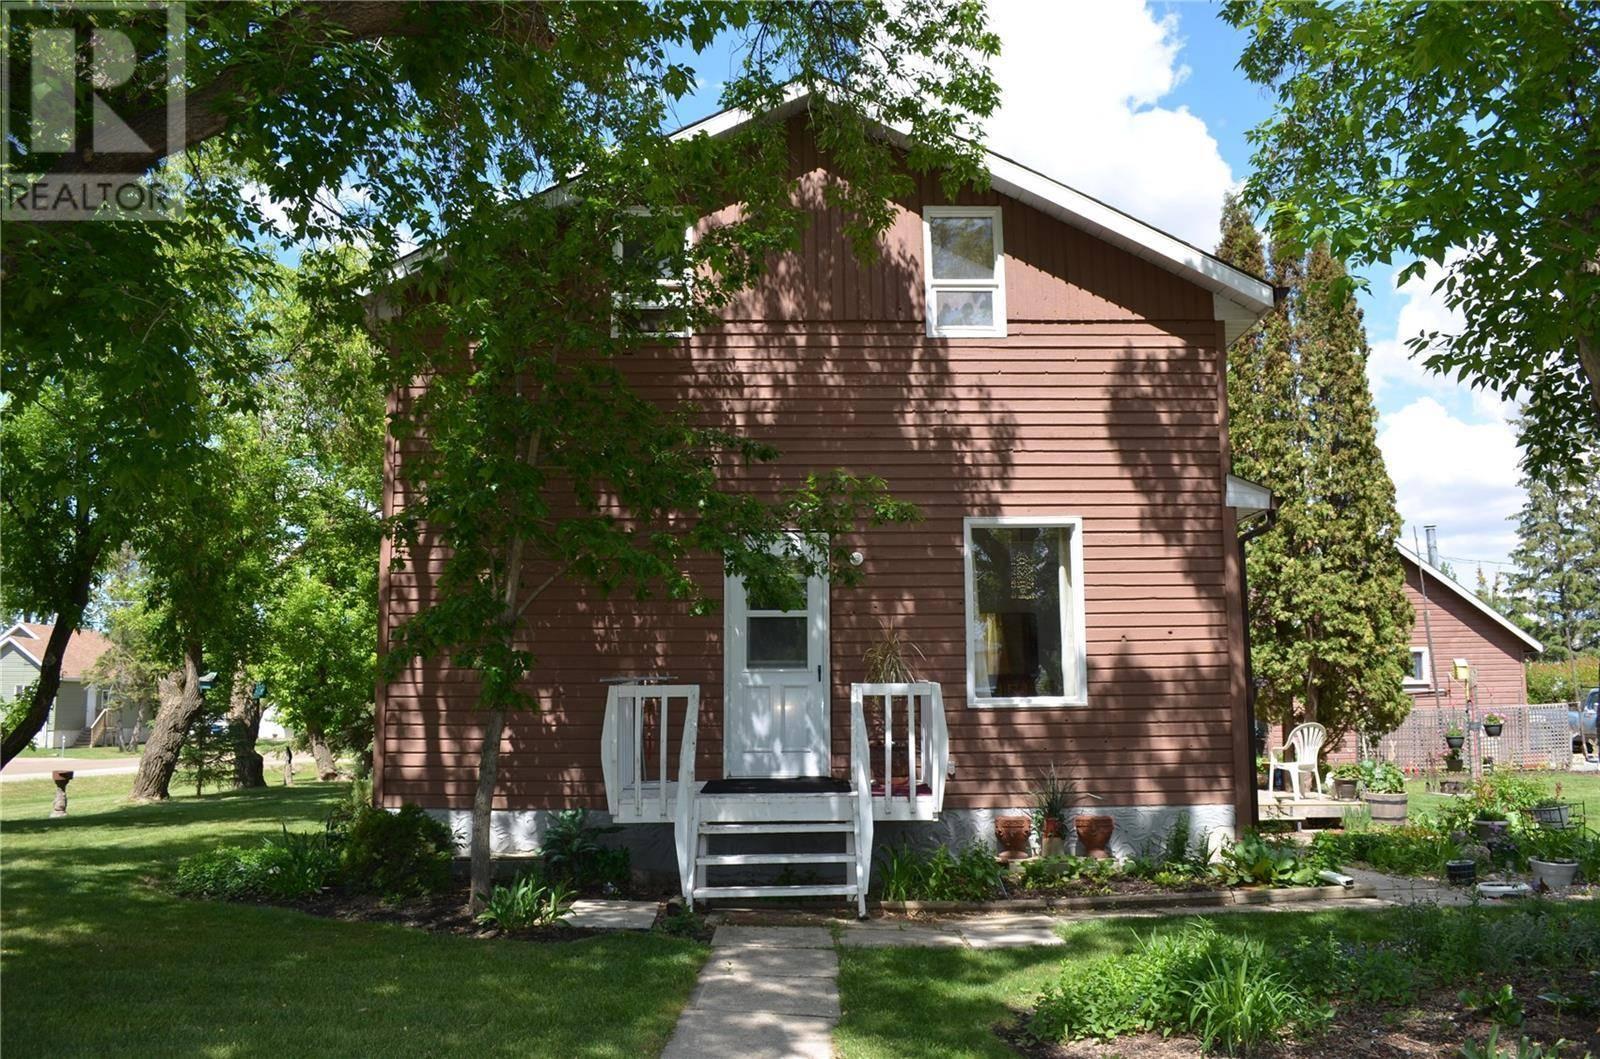 House for sale at 515 Stevens Ave Birch Hills Saskatchewan - MLS: SK777058